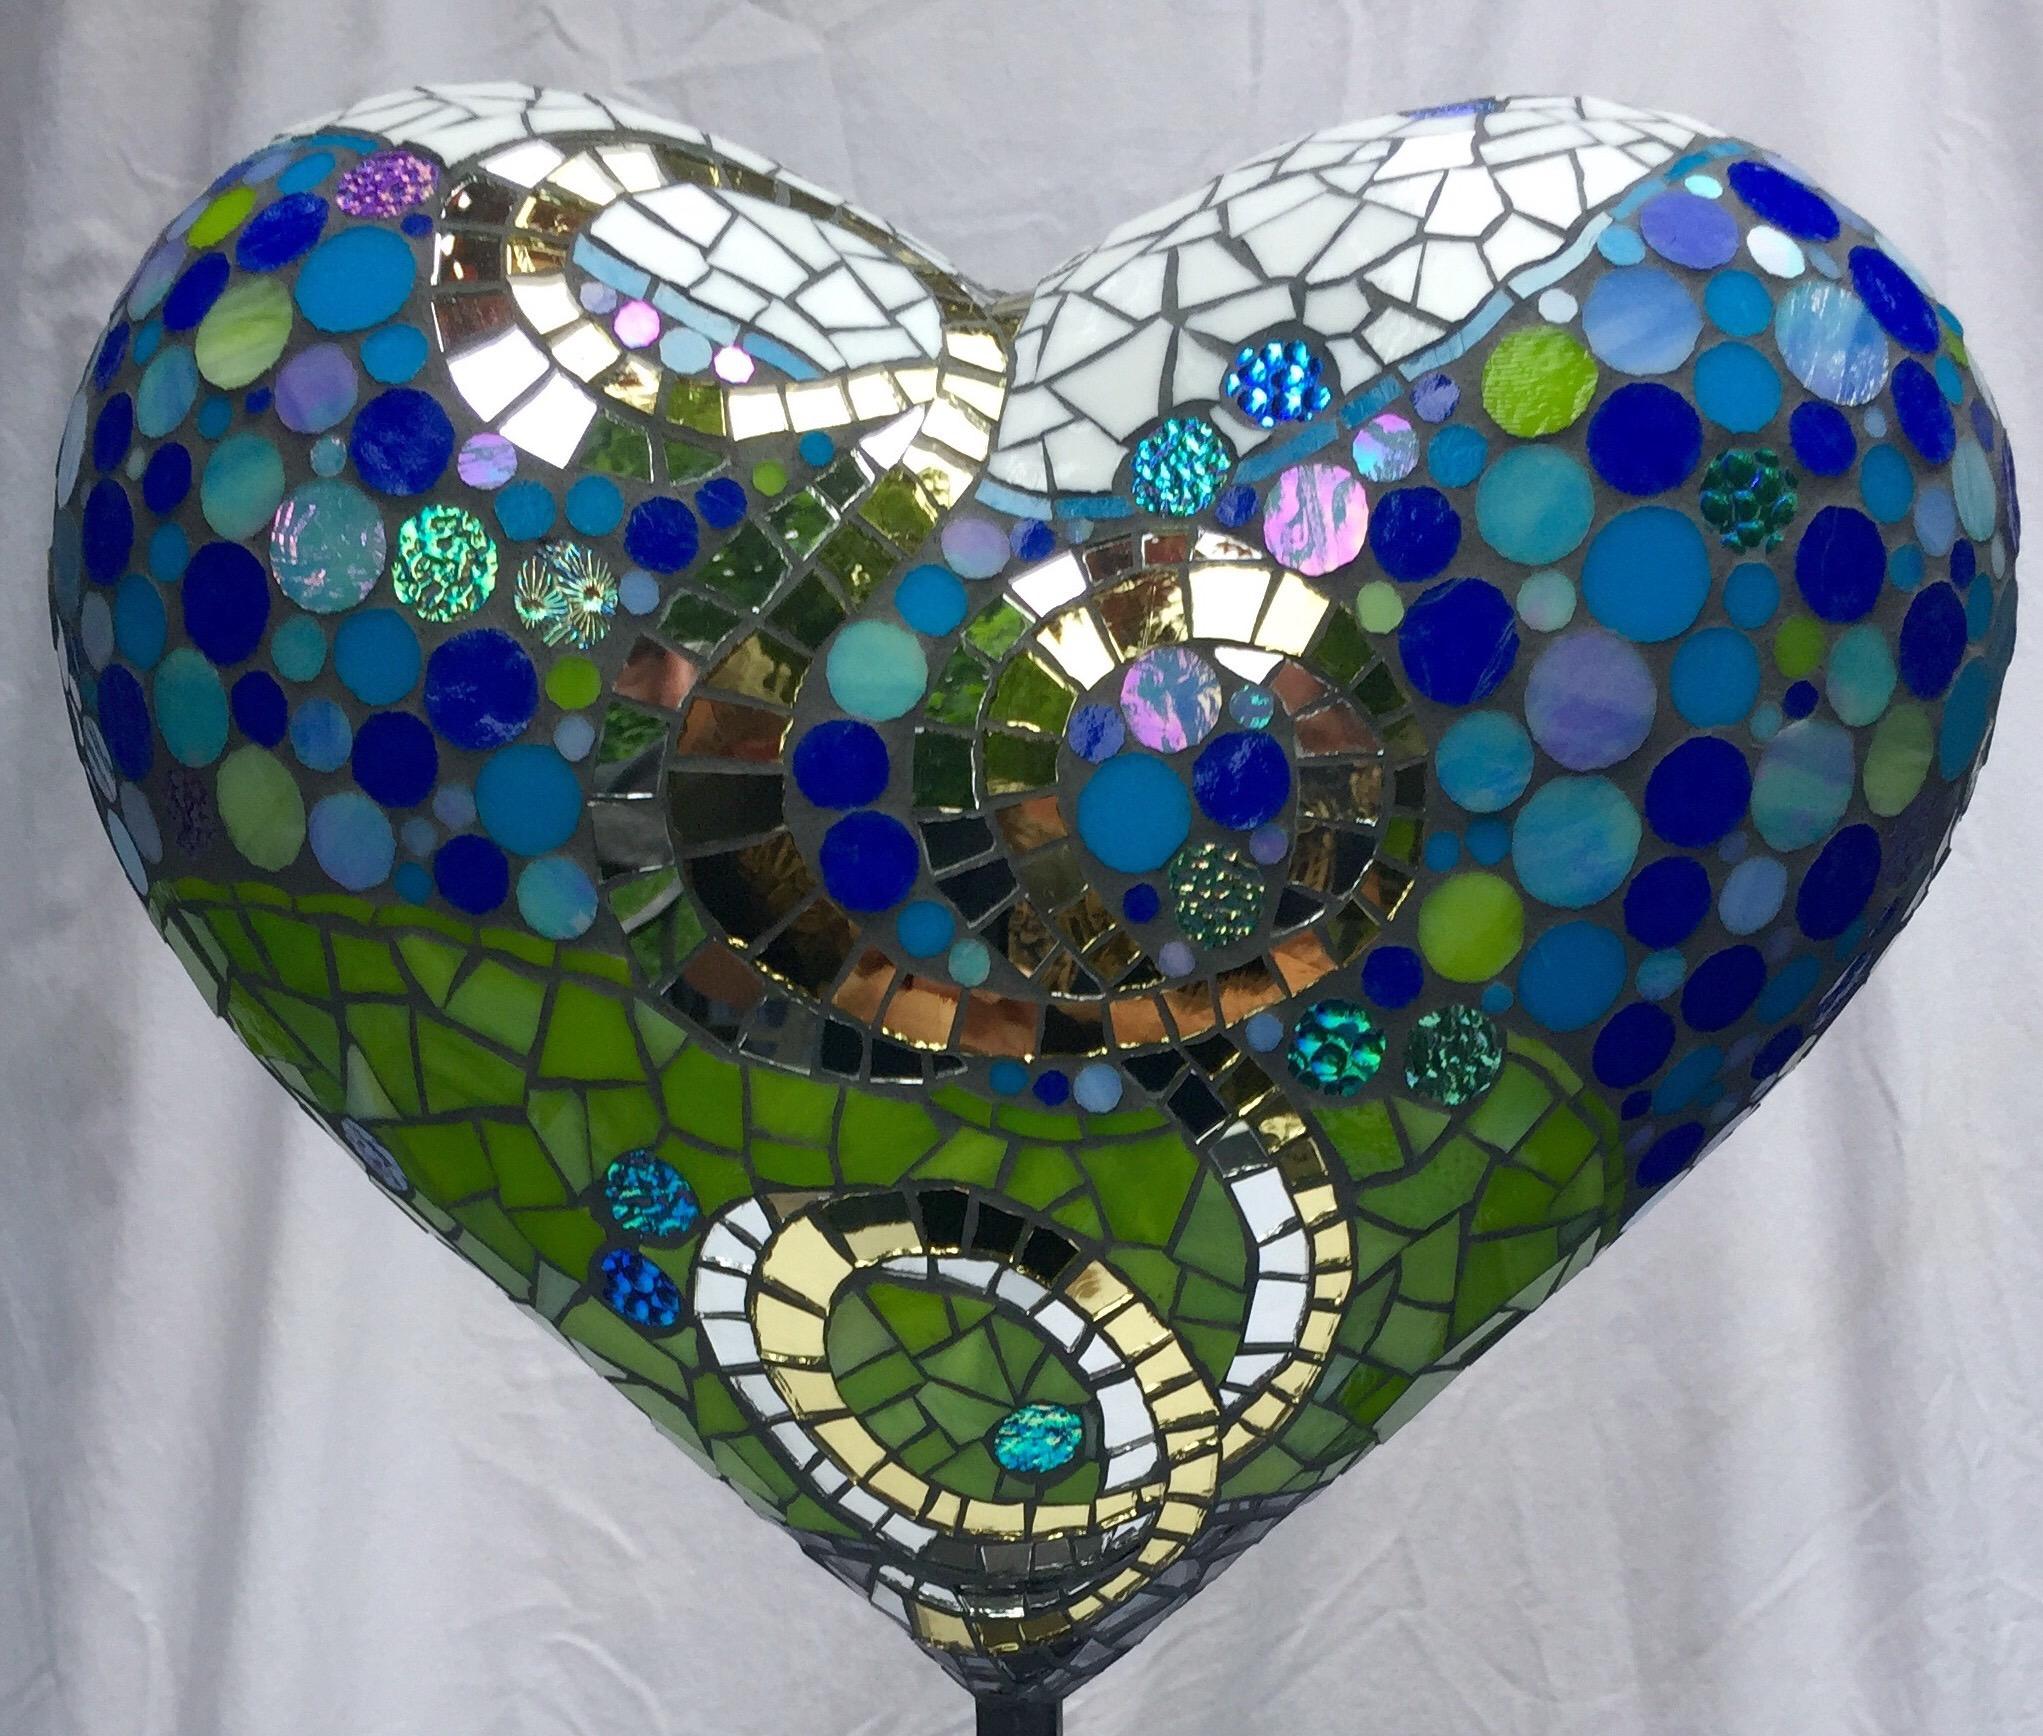 Vicki Murphy, Stone and Water, 2016